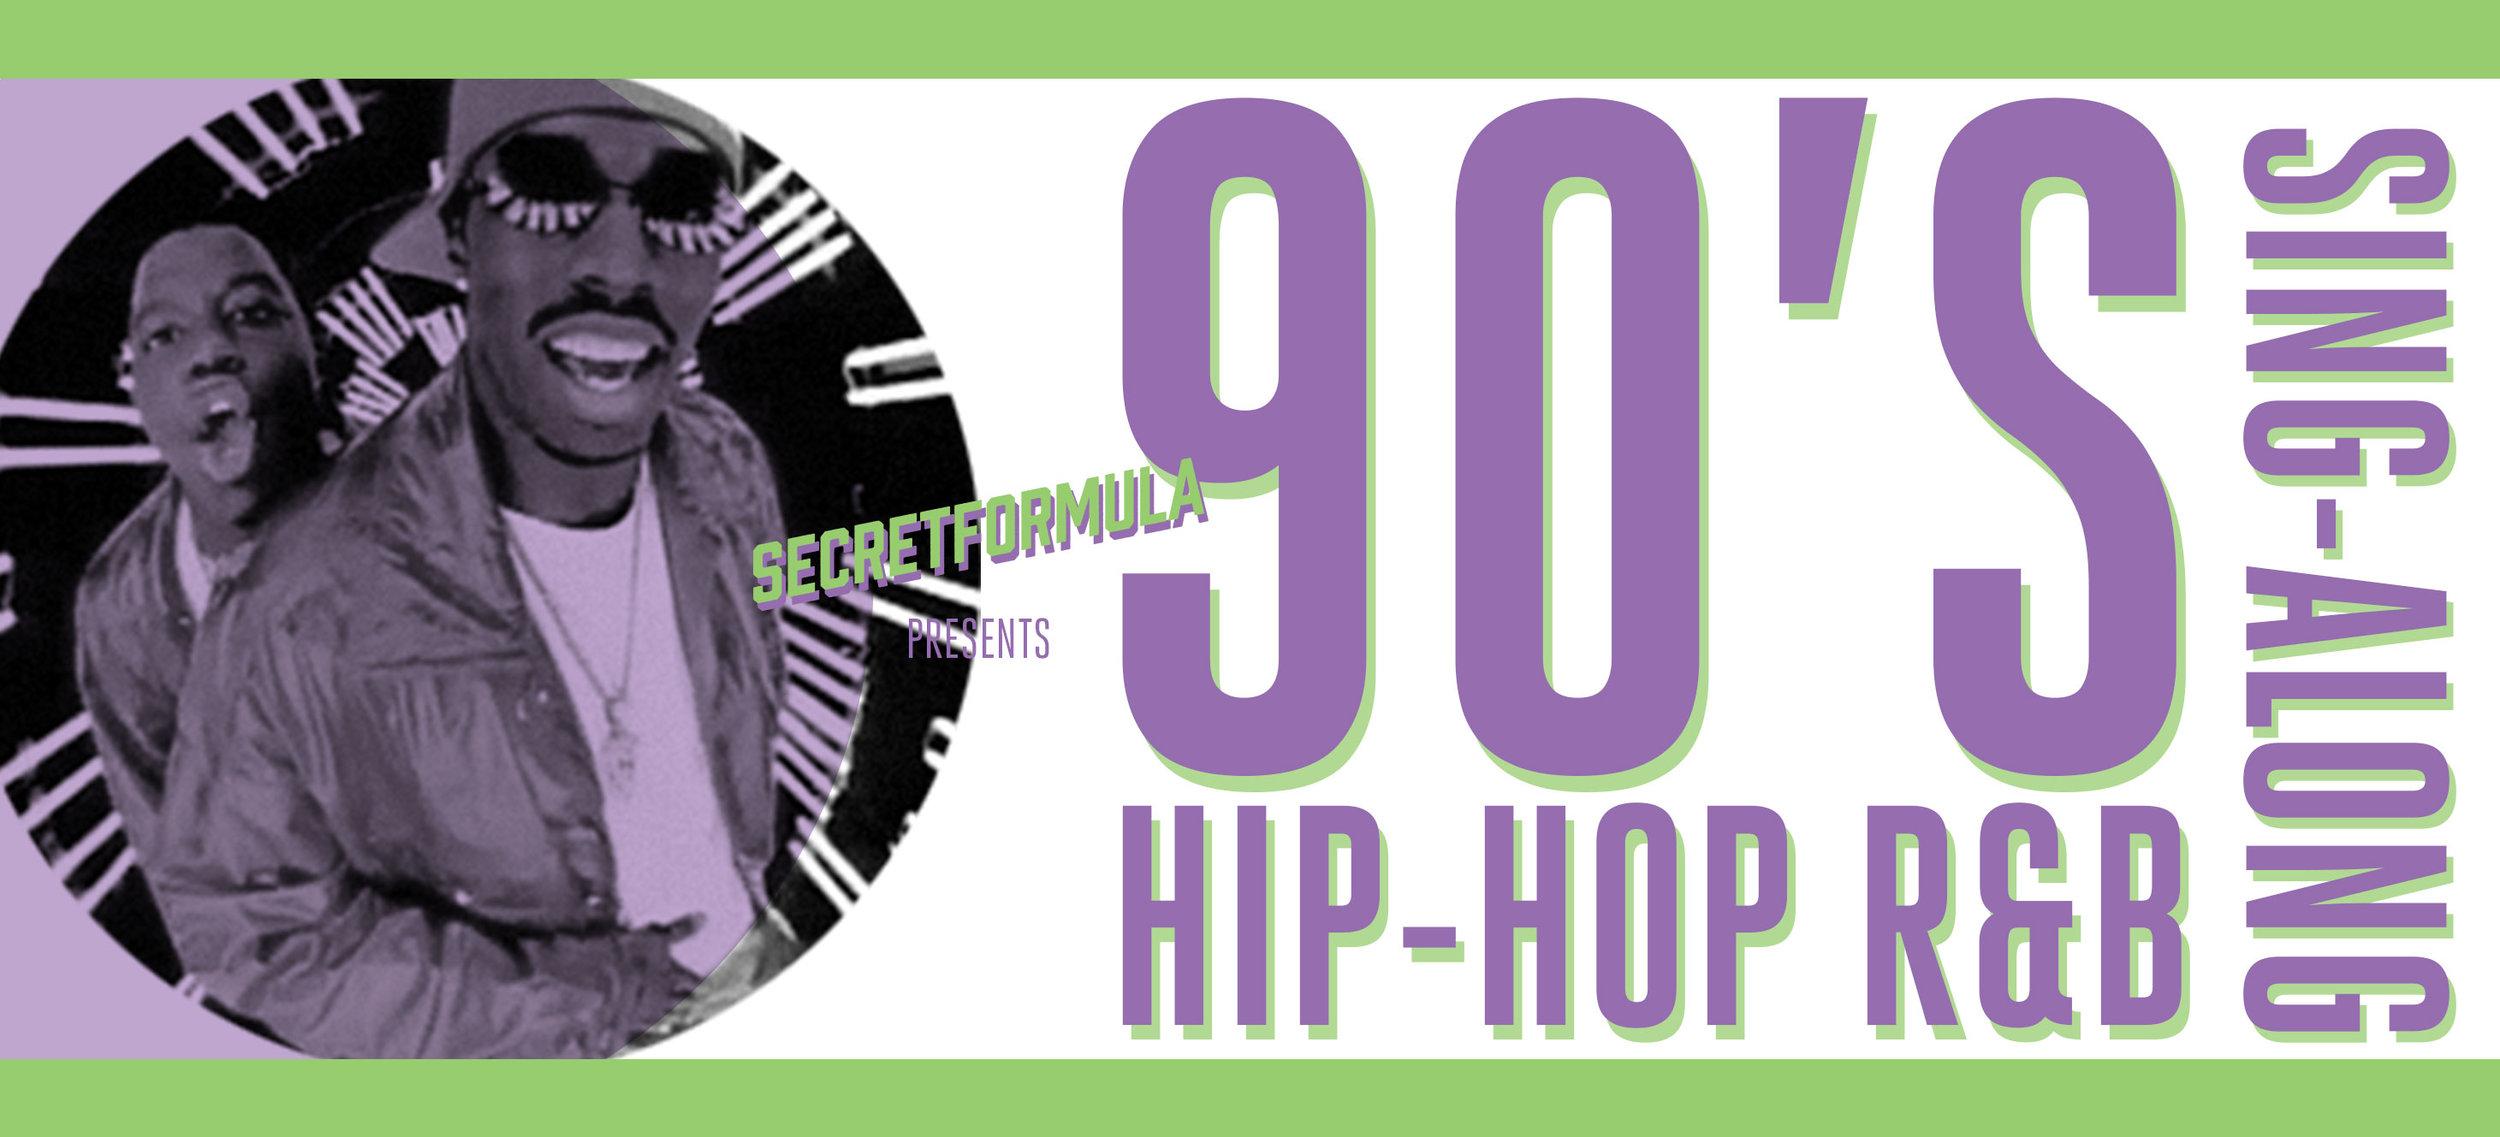 hip-hop-sing-along-cover.jpg